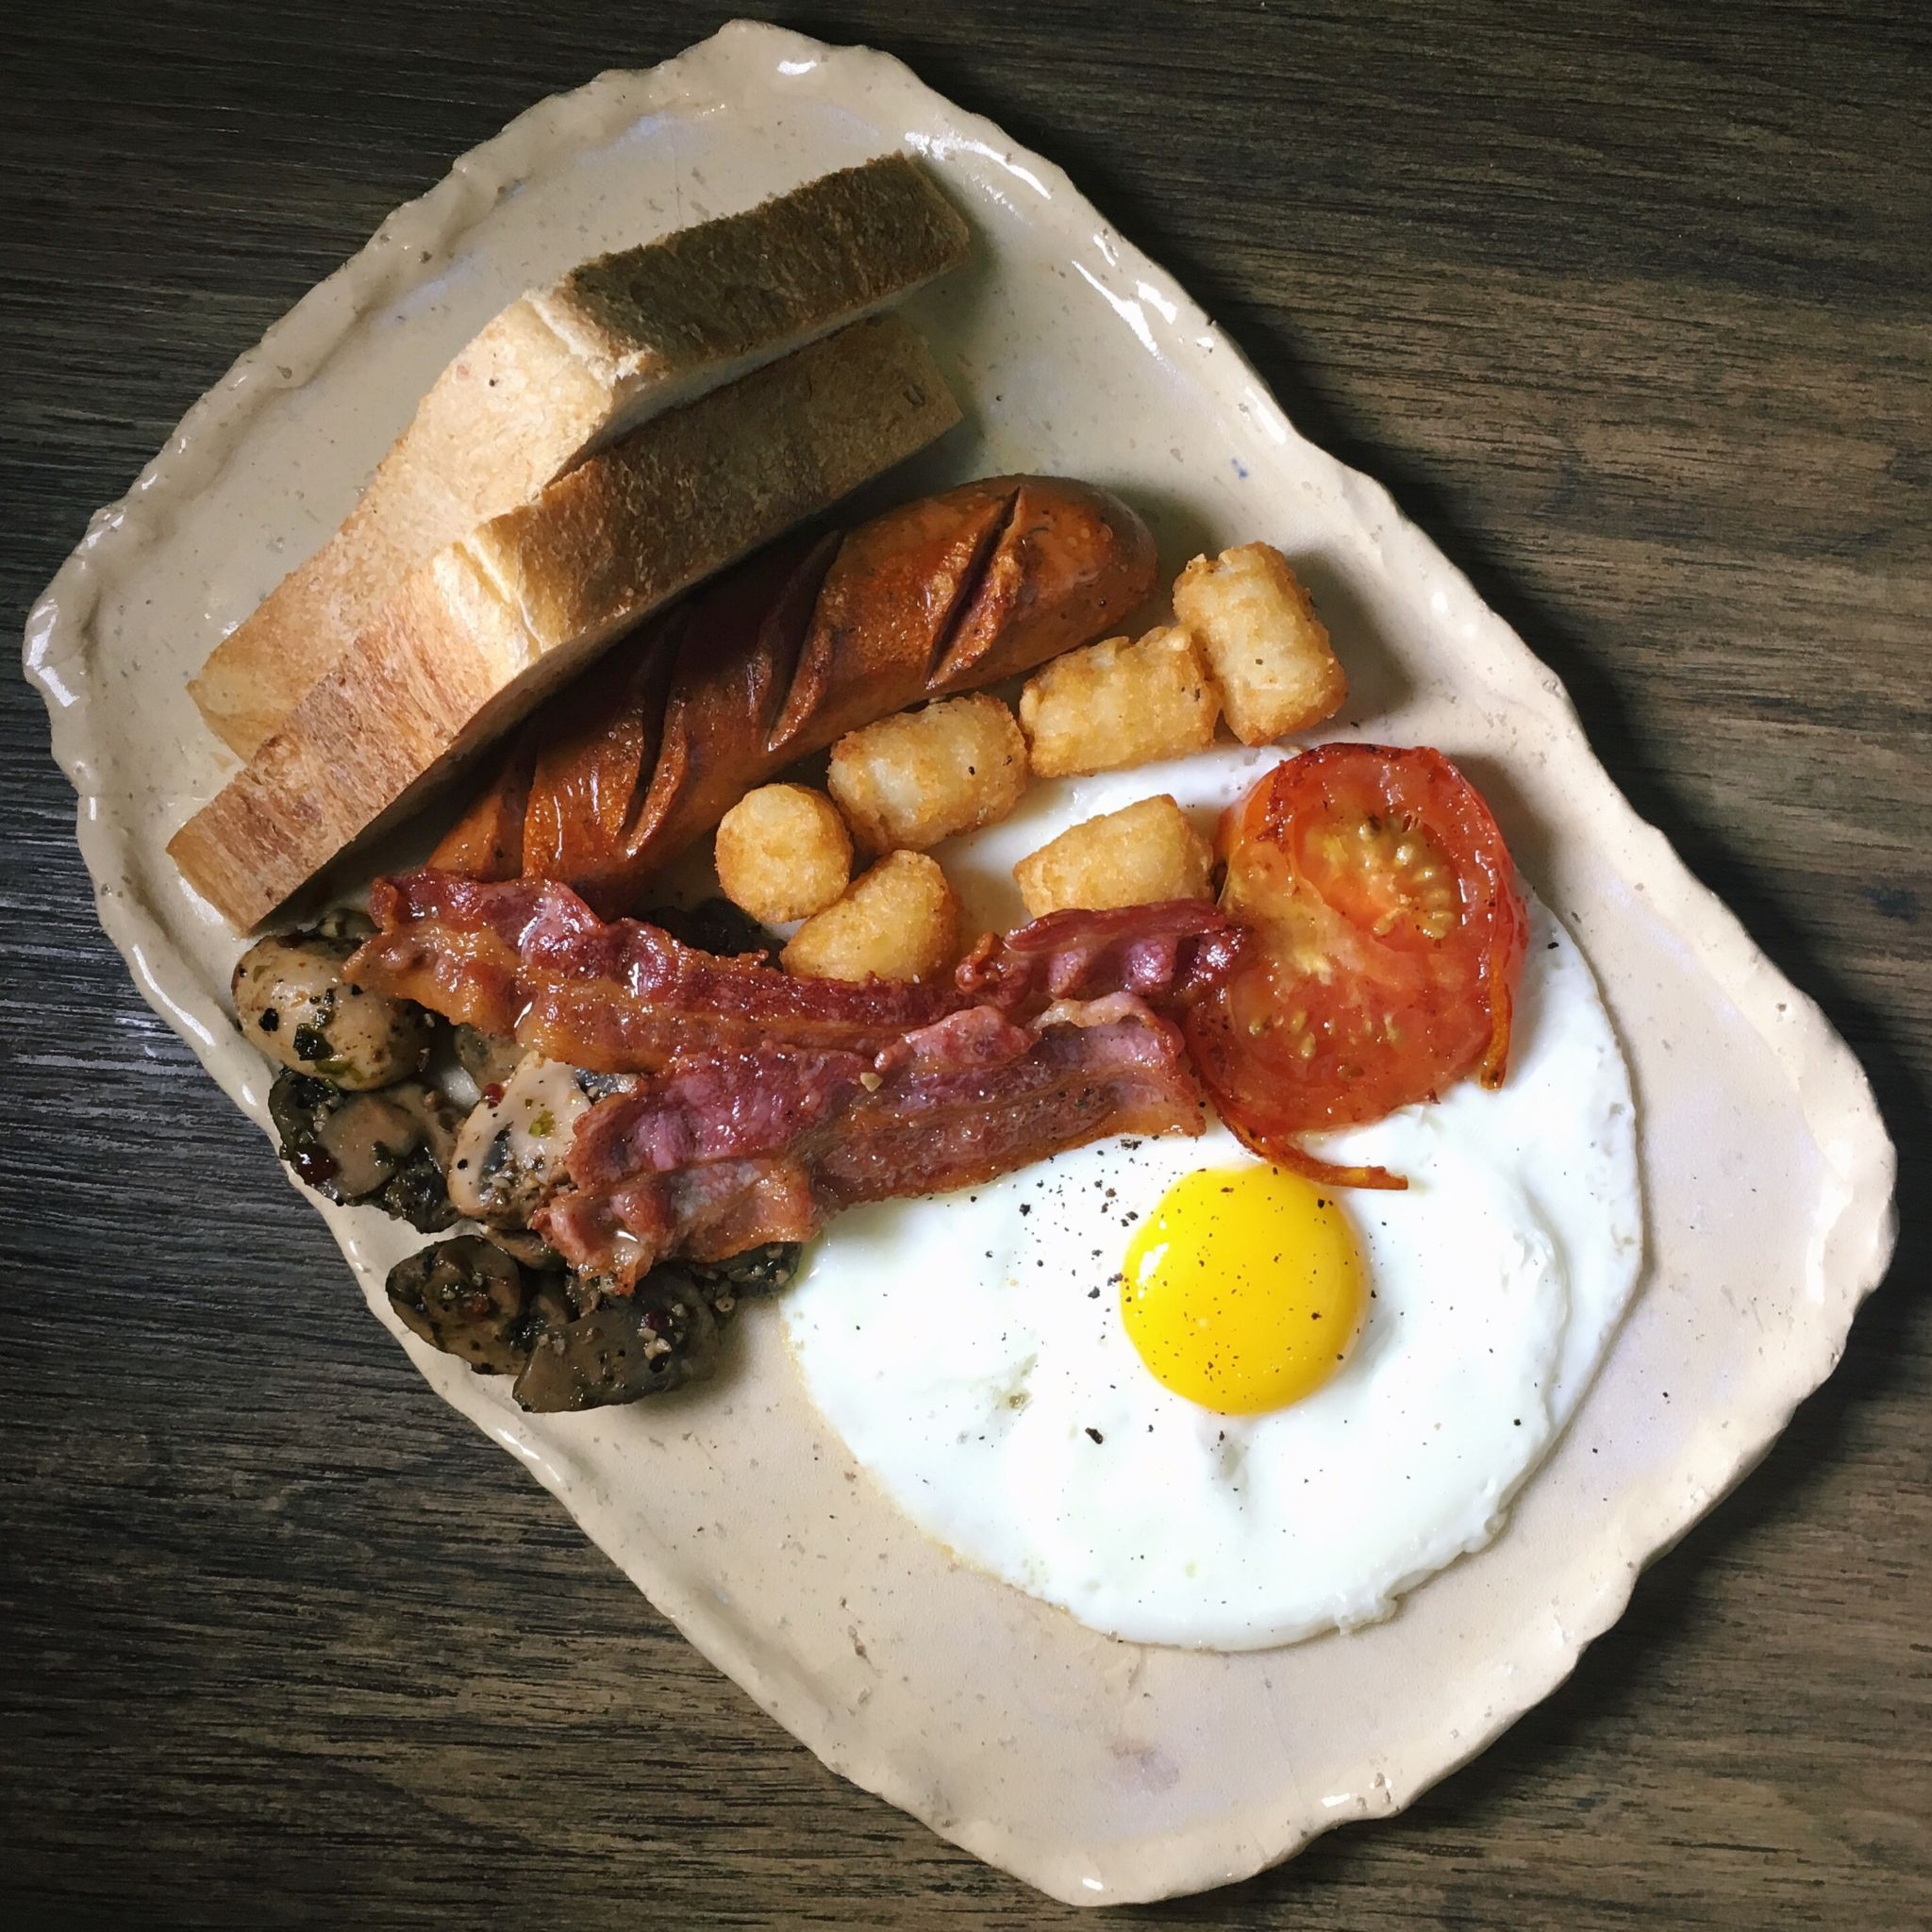 British Breakfast Platter - The Clueless Goat